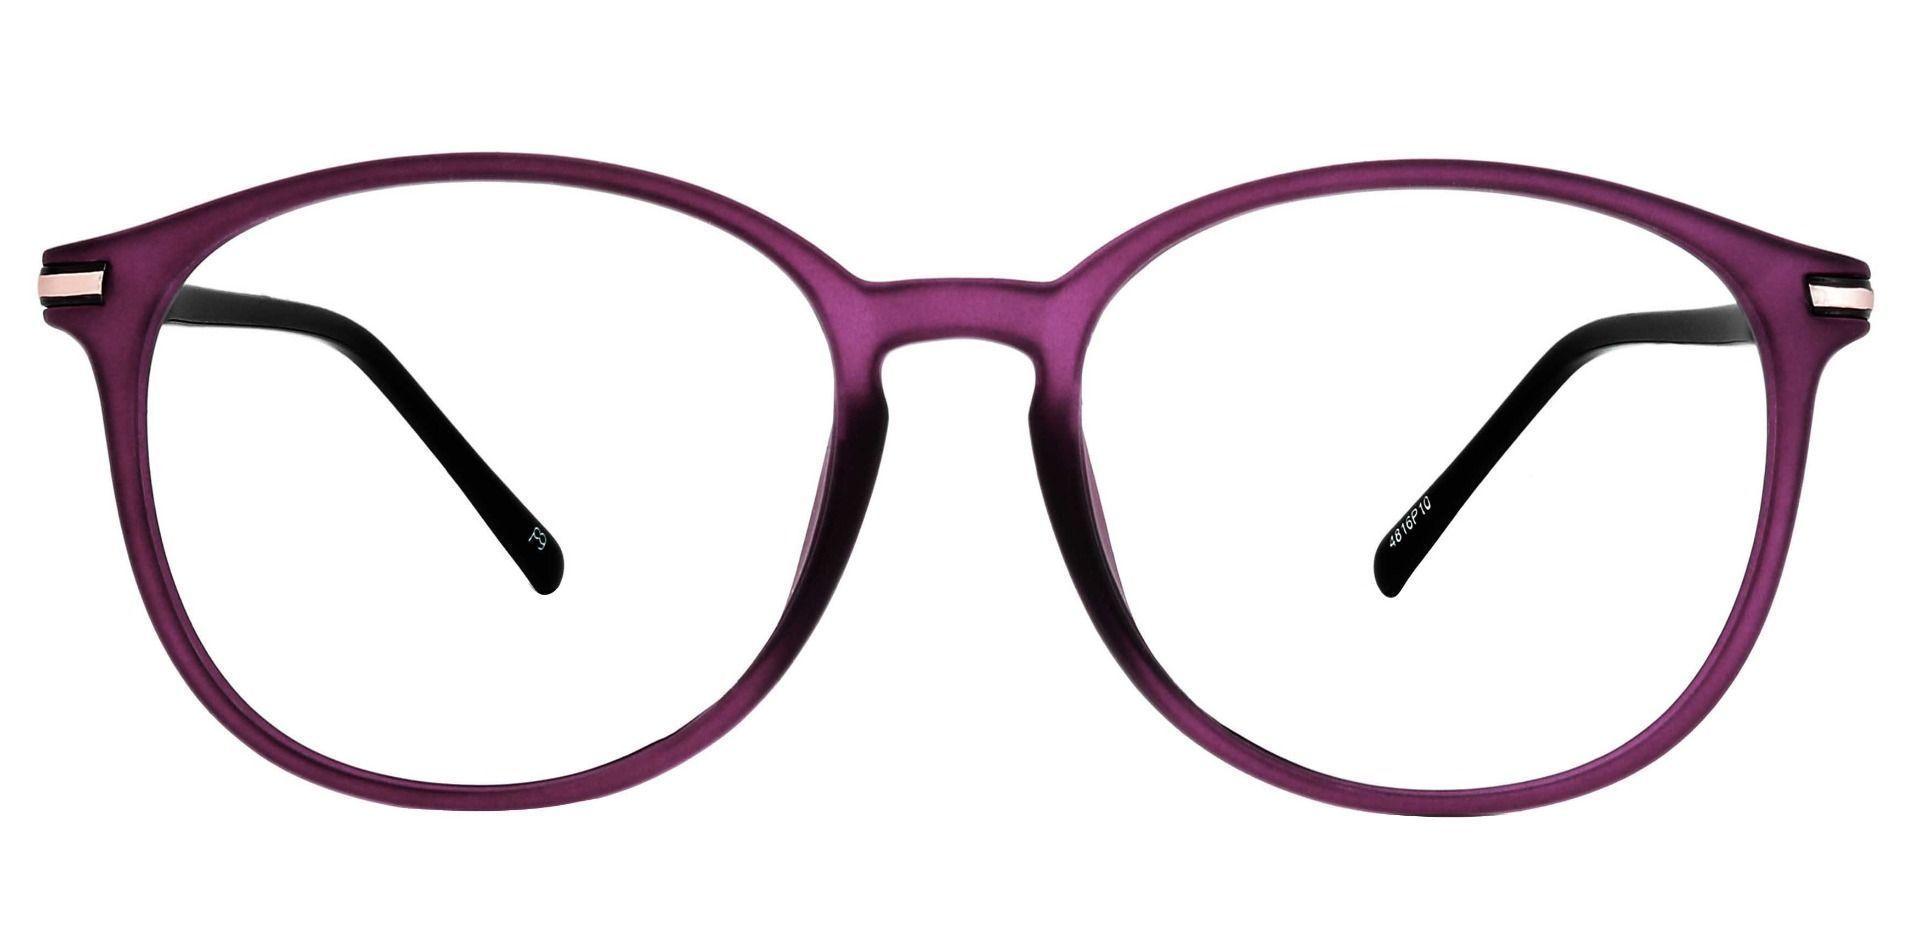 Rainier Oval Lined Bifocal Glasses - Purple